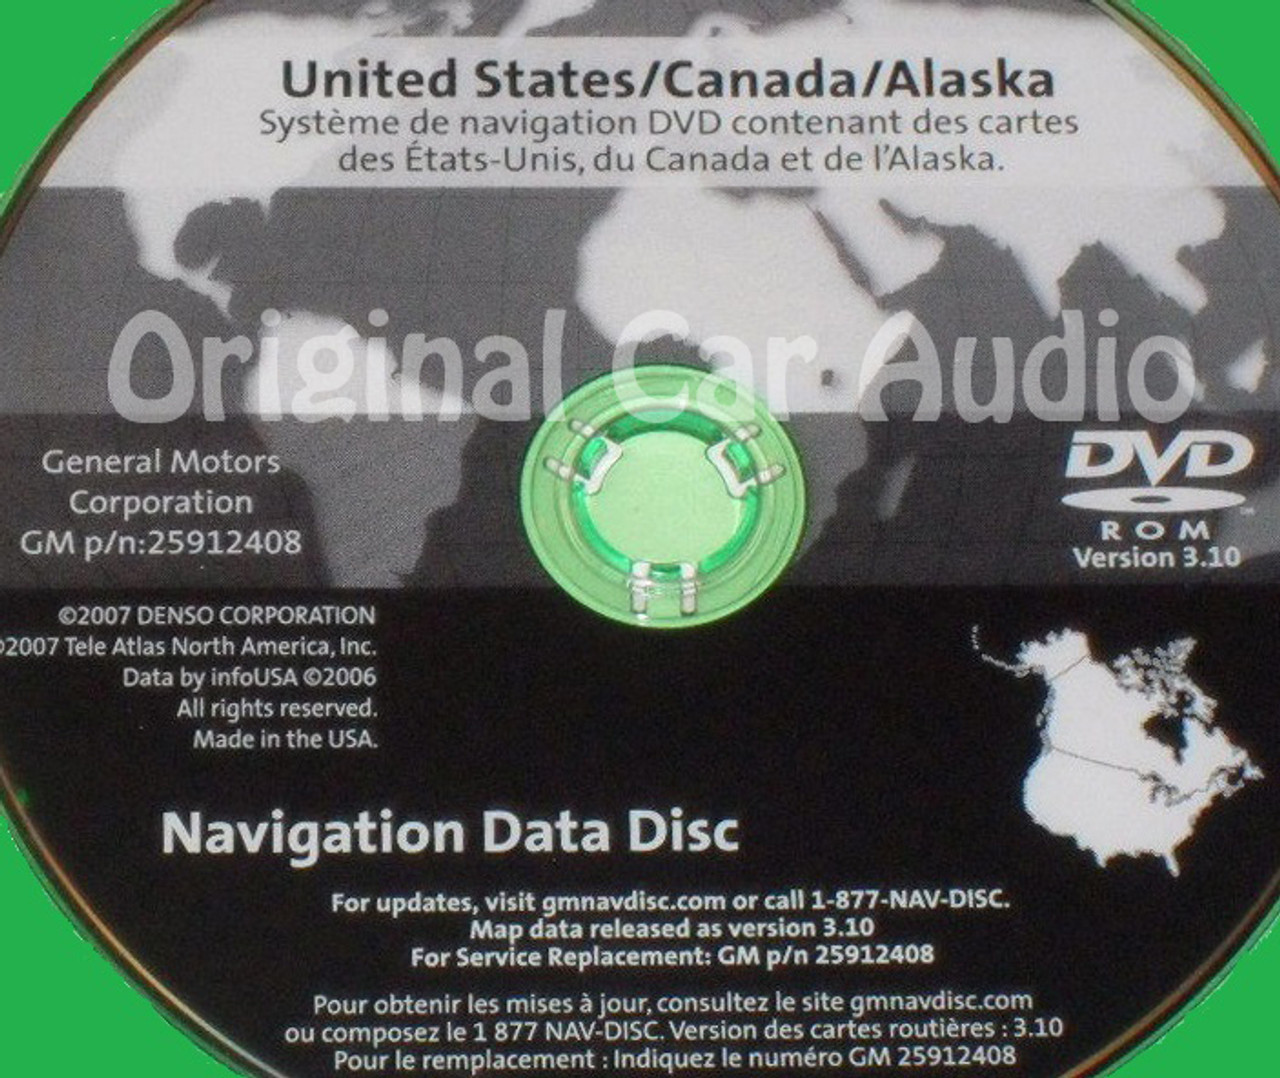 GM Satellite Navigation System CD 25912408 Version 3 10